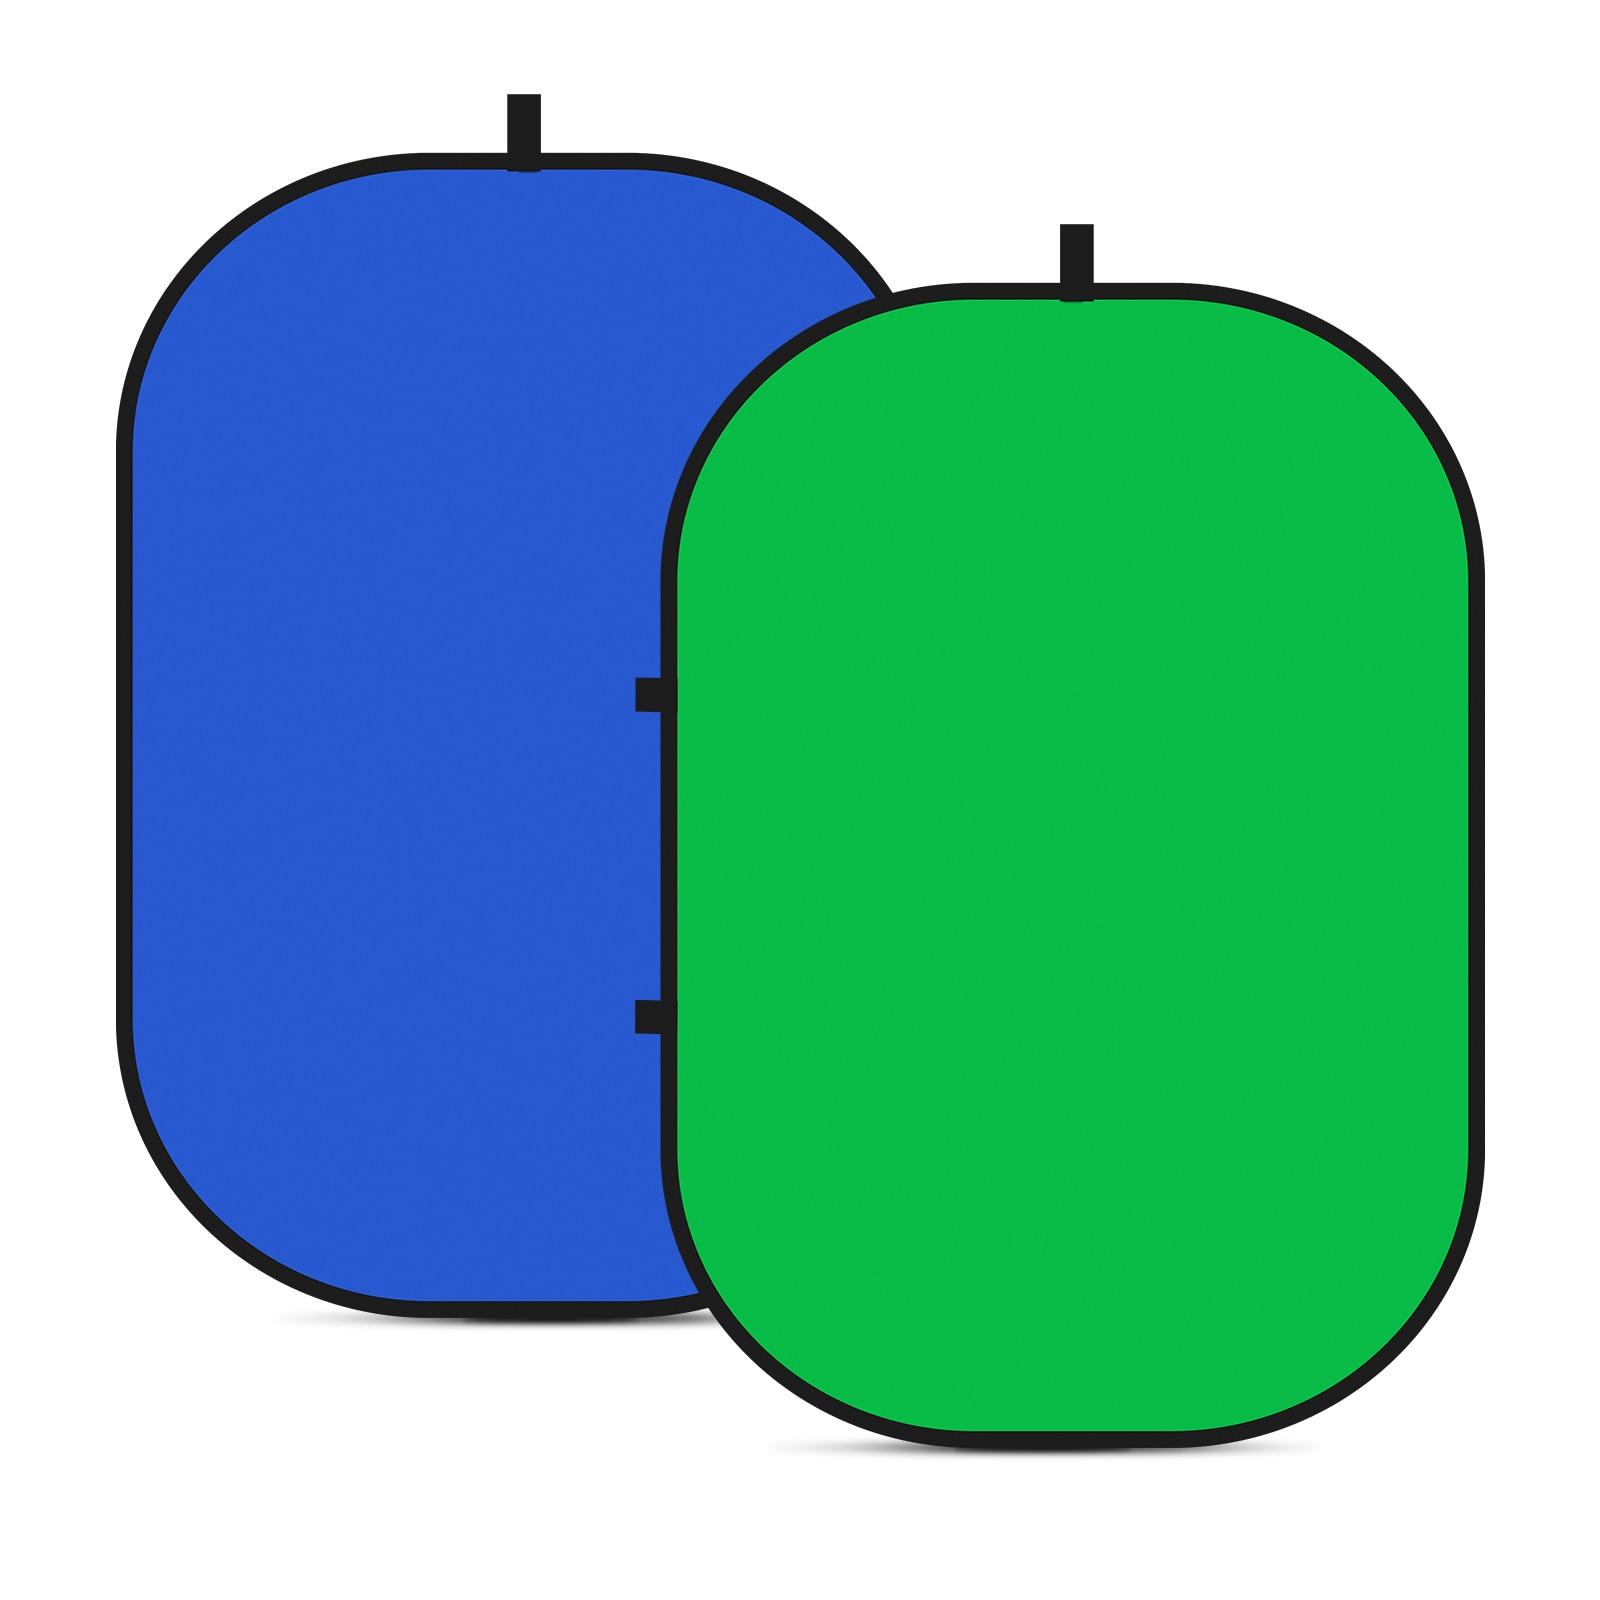 Neewer-خلفية Chromakey 2 في 1 للتصوير الفوتوغرافي والألعاب والبث المباشر ، وخلفية قابلة للطي ، وشاشة خضراء وزرقاء